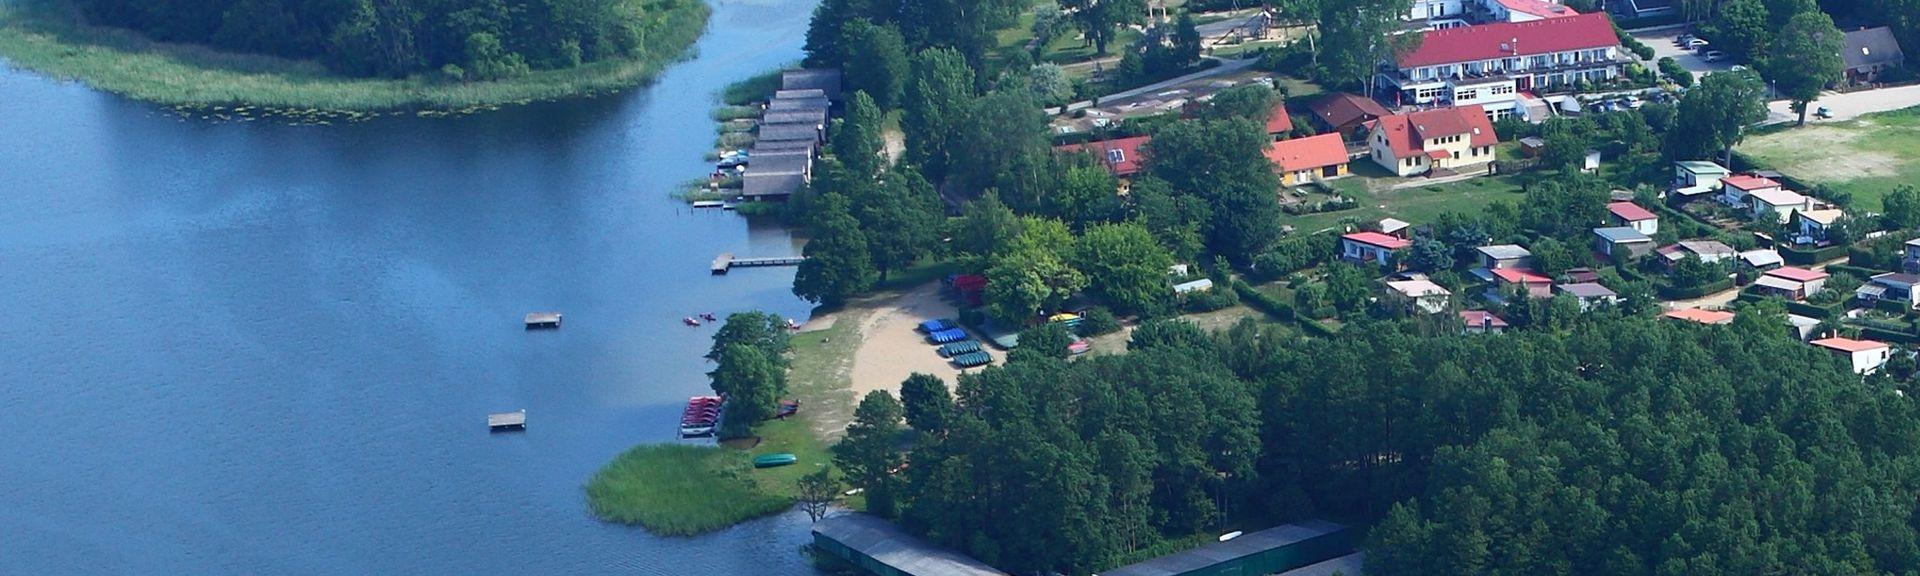 Mecklenburger Seenplatte, Mecklemburgo - Pomerânia Ocidental, Alemanha